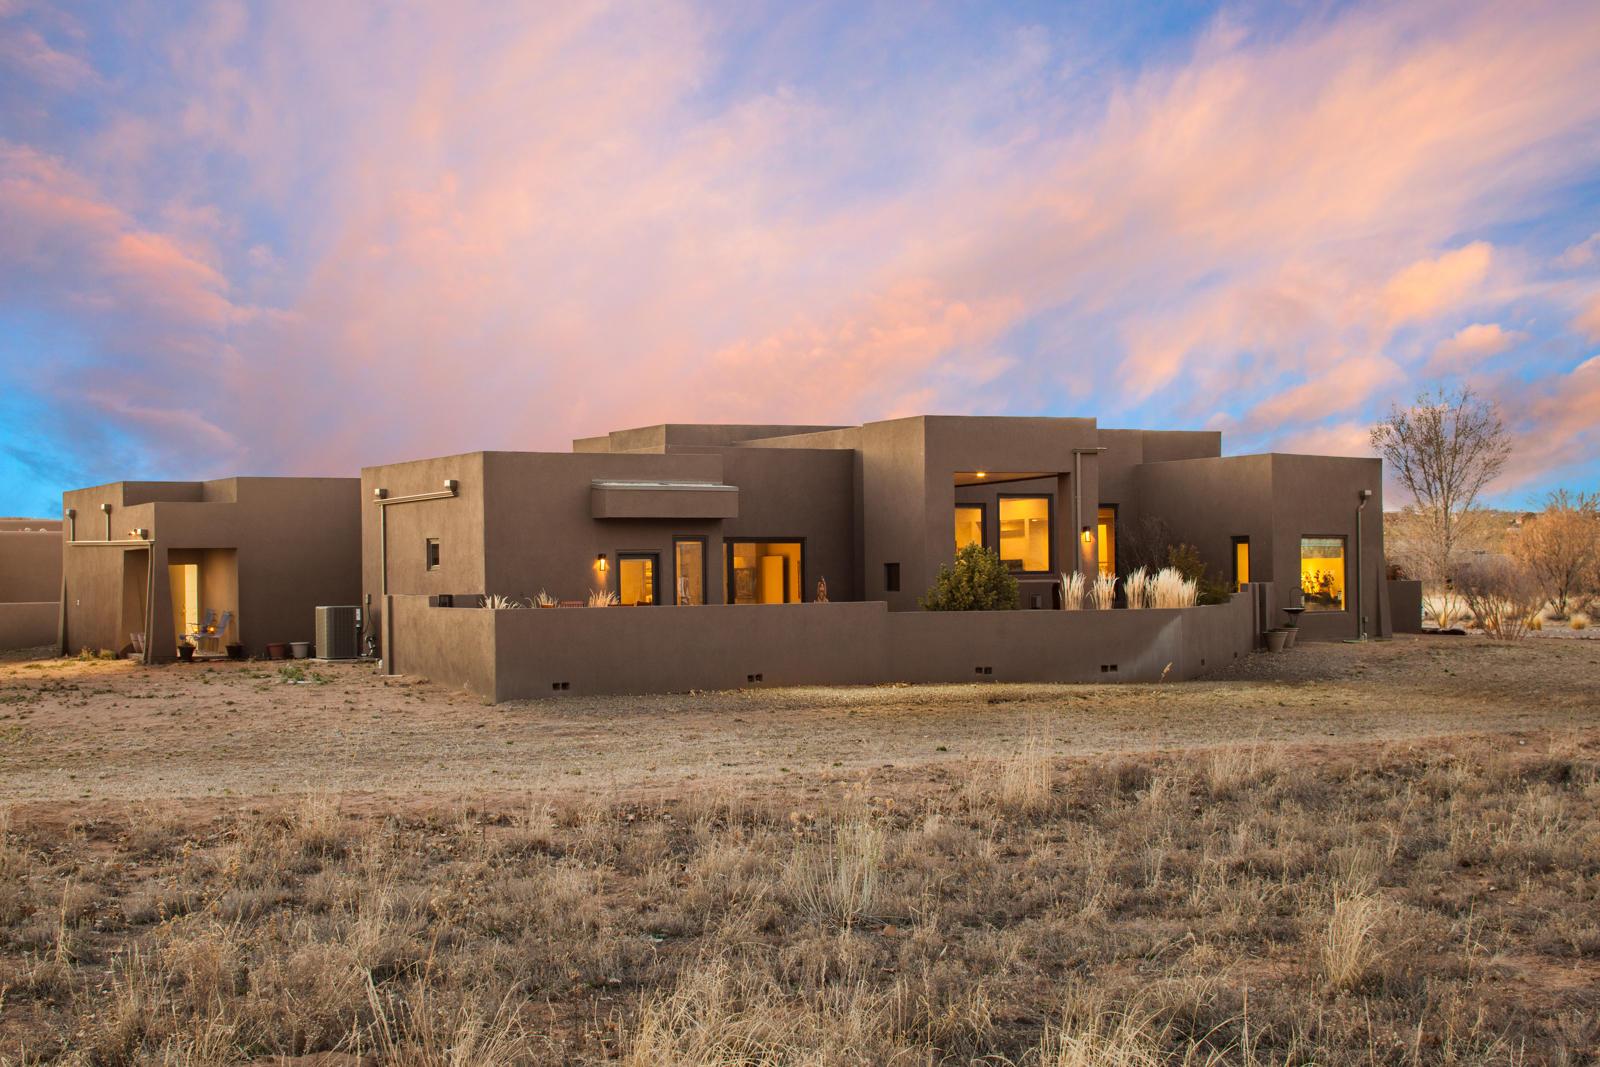 105 MESA VISTA Road, Corrales, NM 87048 - Corrales, NM real estate listing